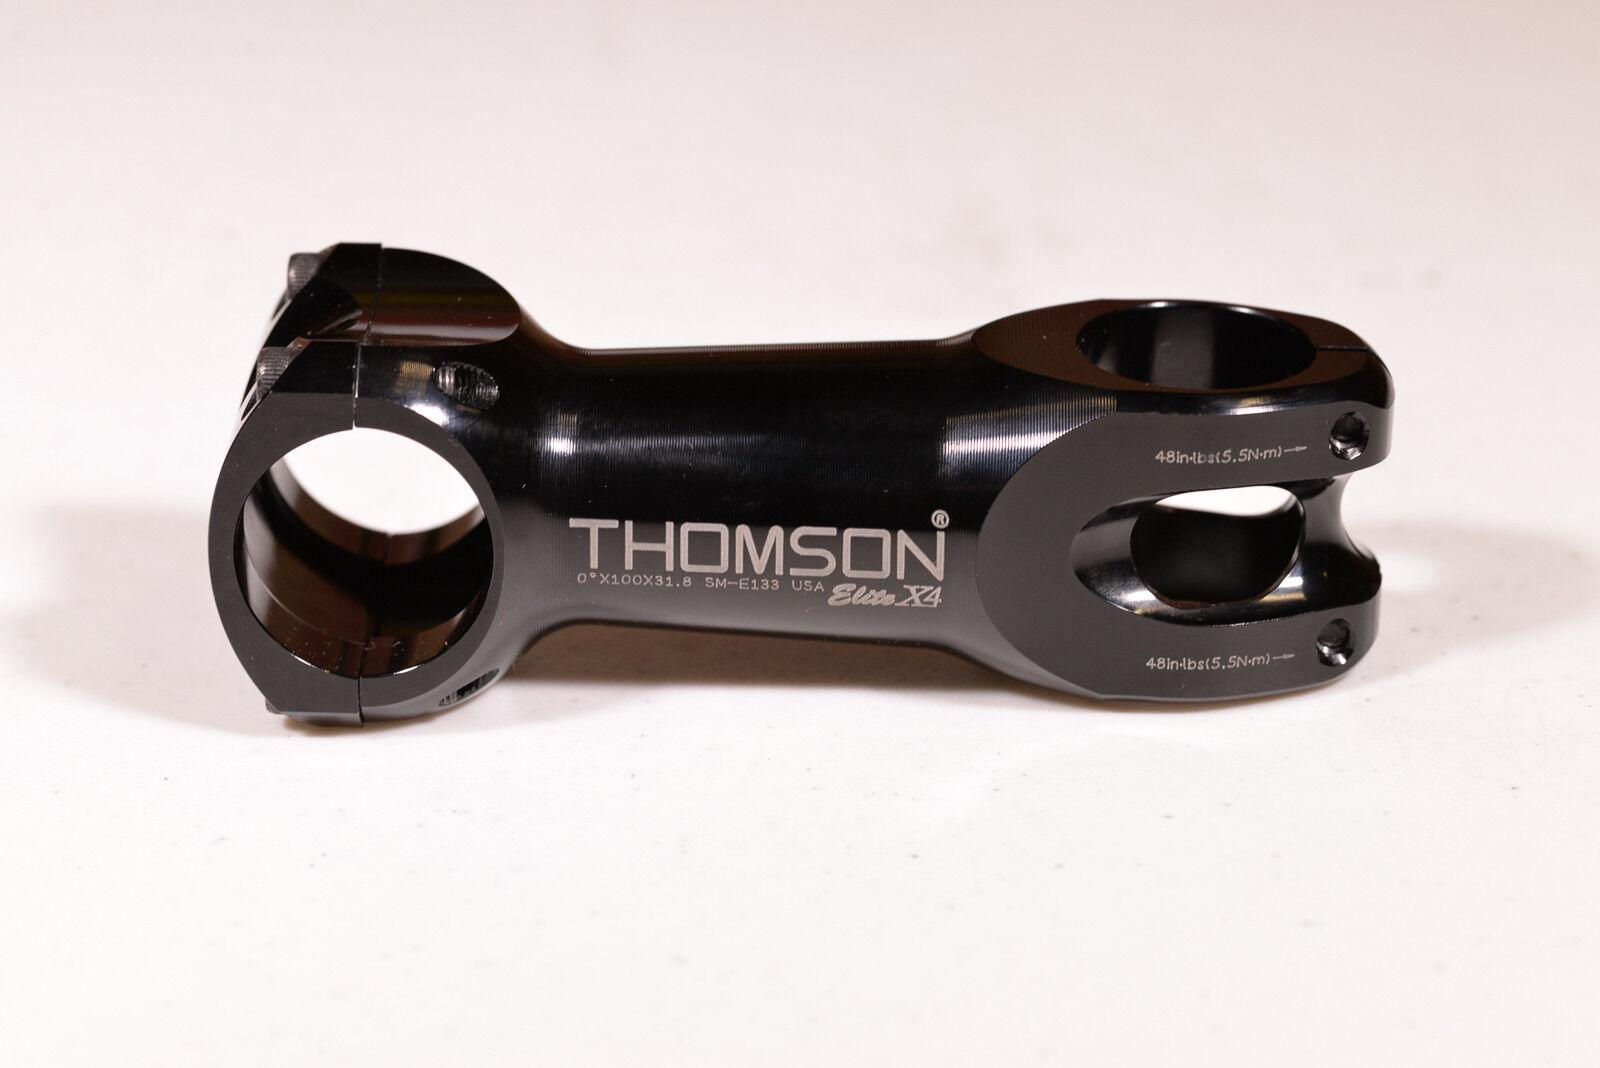 Thomson Elite X4 0 x100x31.8 Alloy Stem